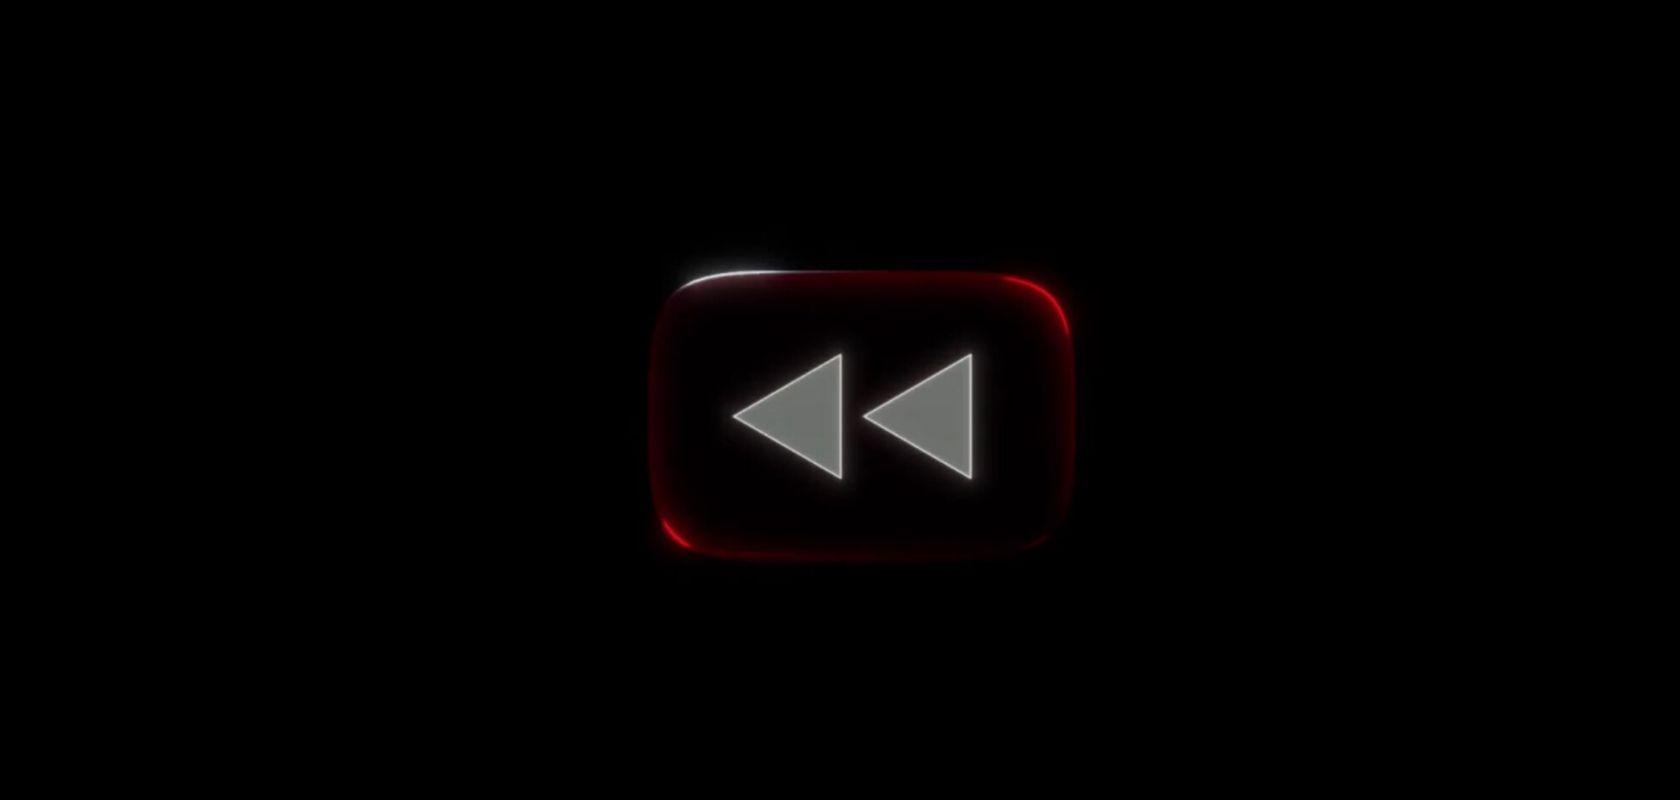 youtube rewind 2019 - photo #5